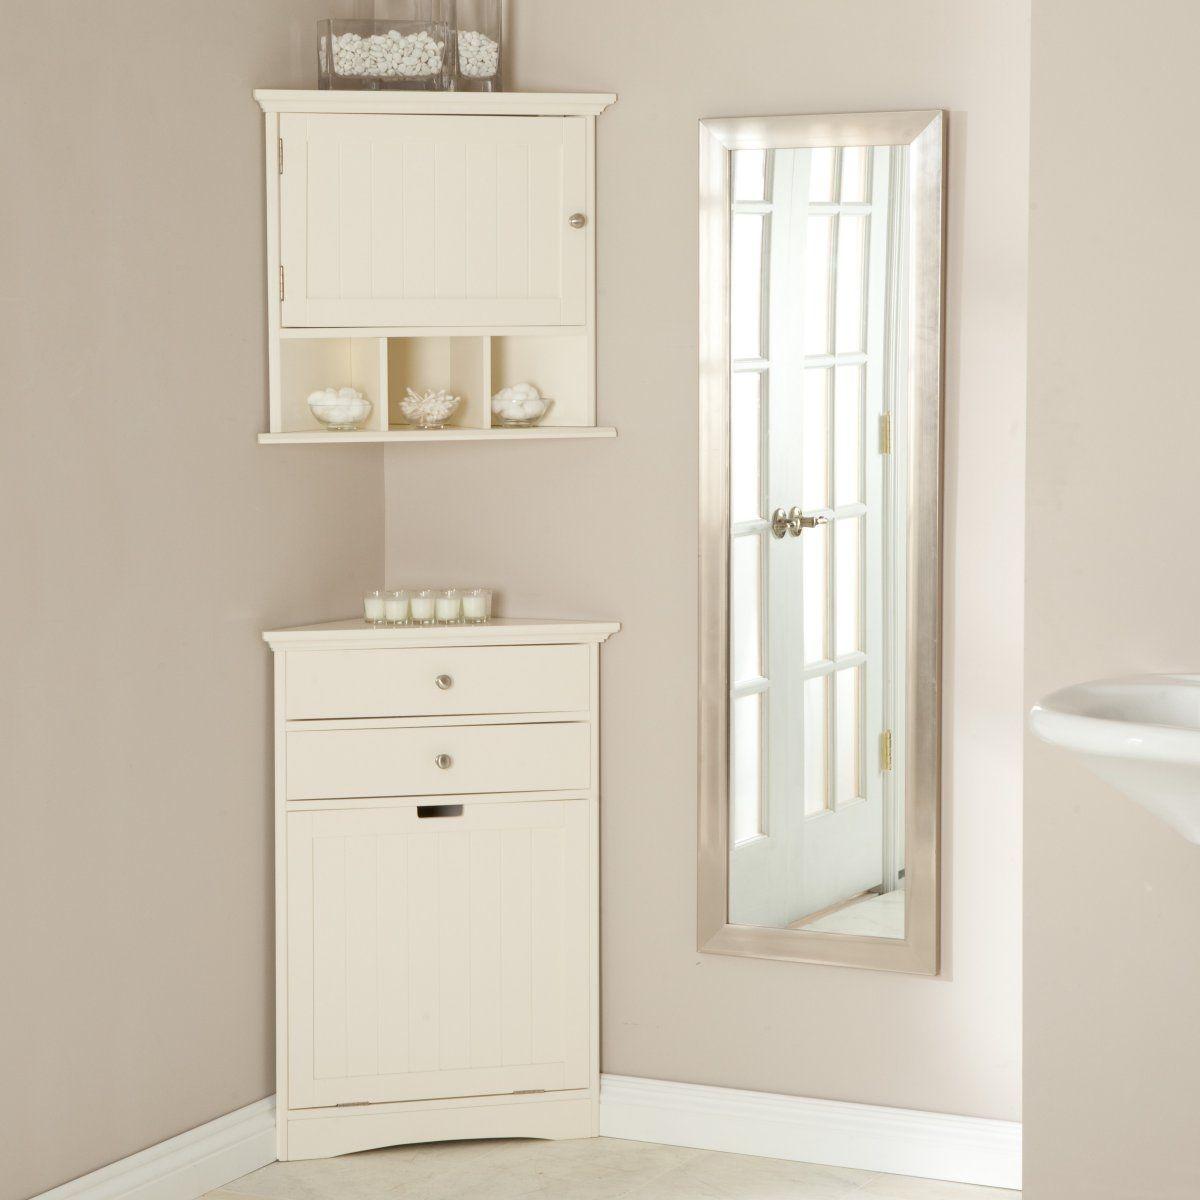 Corner Linen Cabinet Bathroom  Httpbetdaffaires Fascinating Small Corner Wall Cabinet For Bathroom Inspiration Design